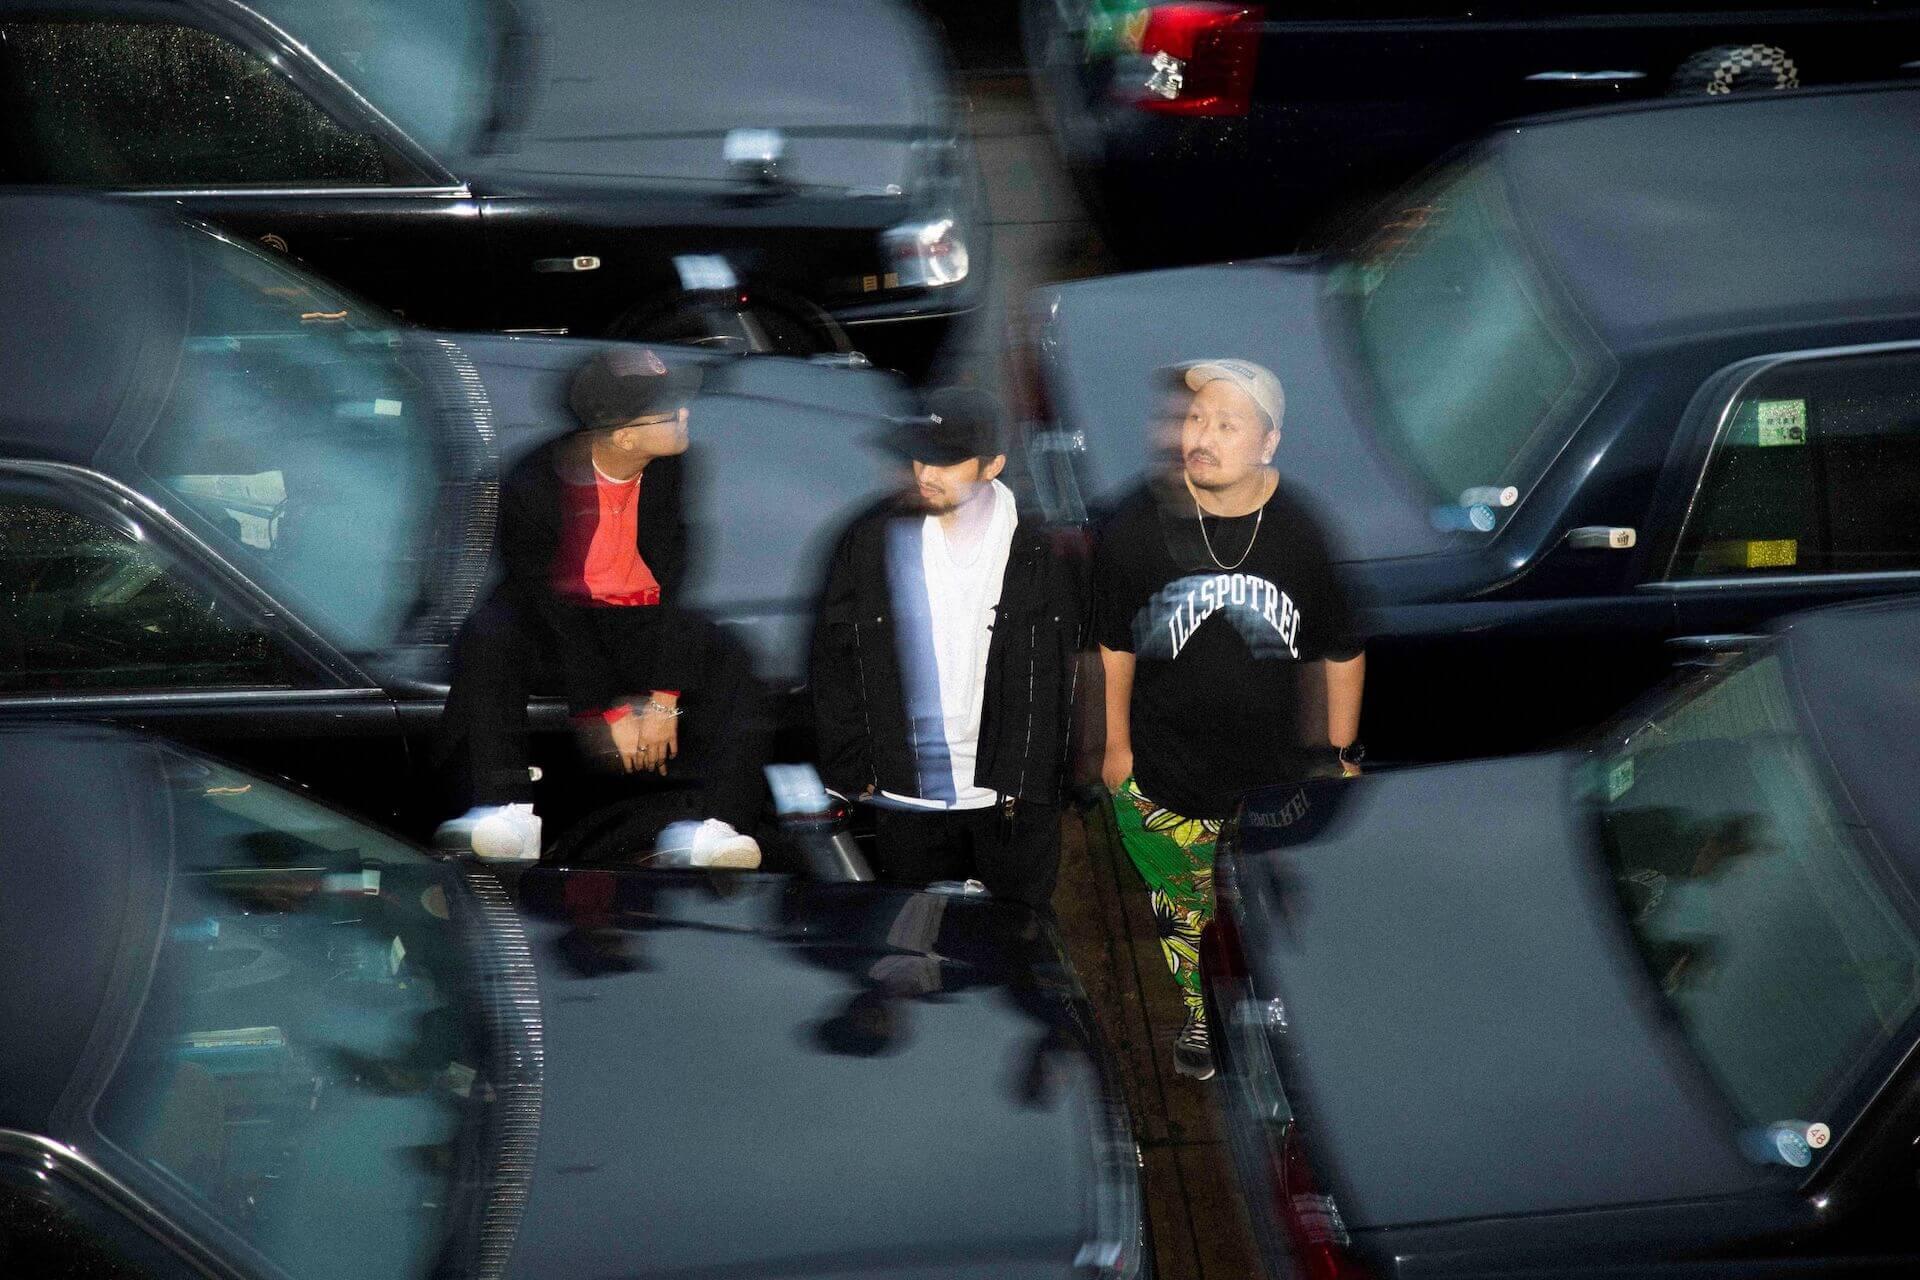 BLABLA、Vue du monde、m-alが結成したユニット・PACK3のデビュー・アルバム 『PACKQAGE』 が本日リリース!客演にはKANDYTOWN・DIAN&MUDやOMSBらが参加 music2020124_pack3_packqage_1